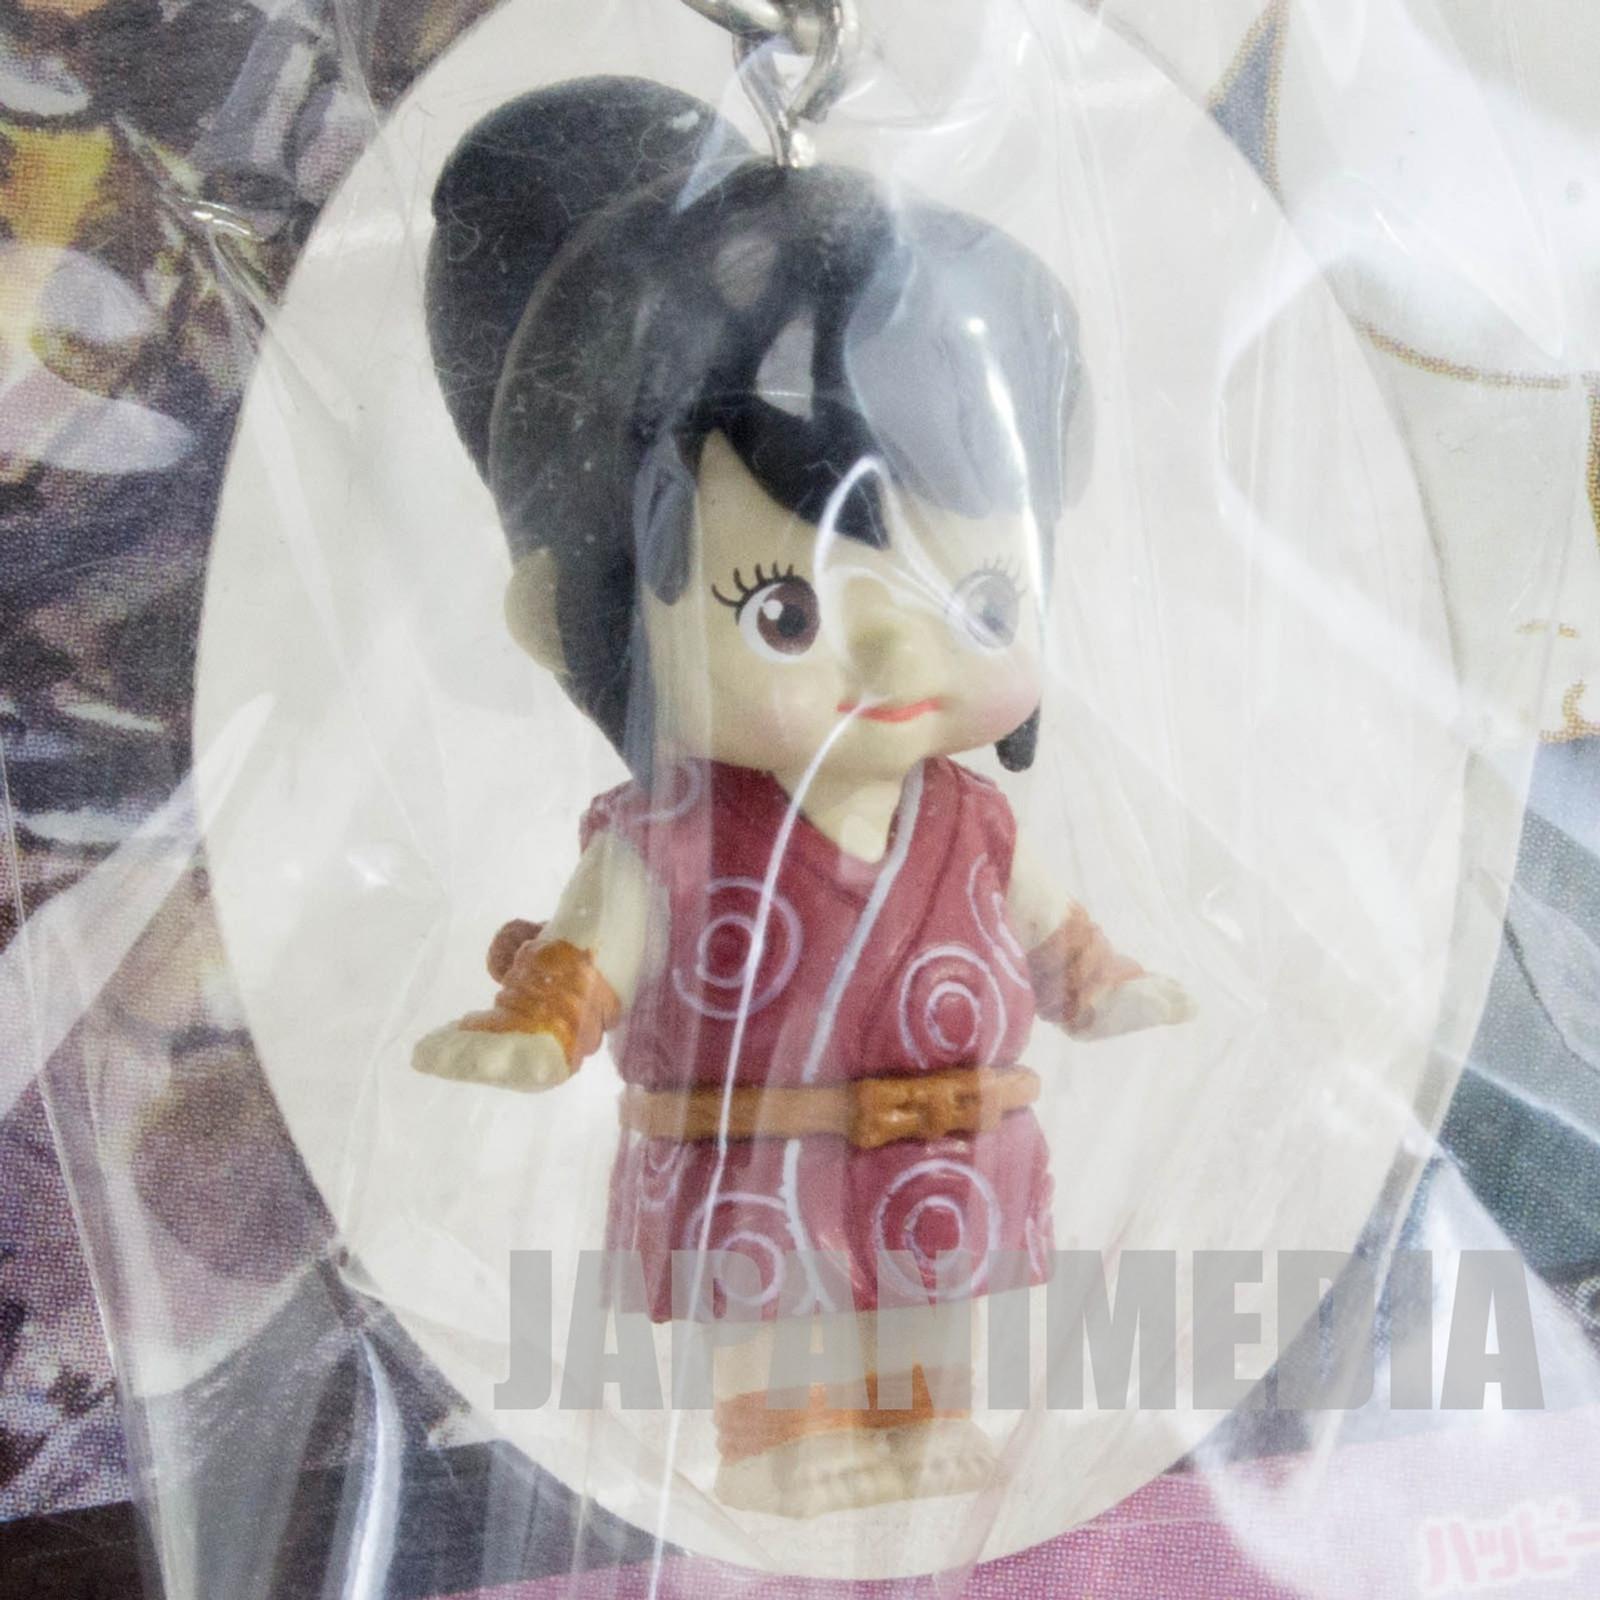 Kamui The Ninja Gaiden Rose O'neill Kewpie Kewsion Strap JAPAN ANIME